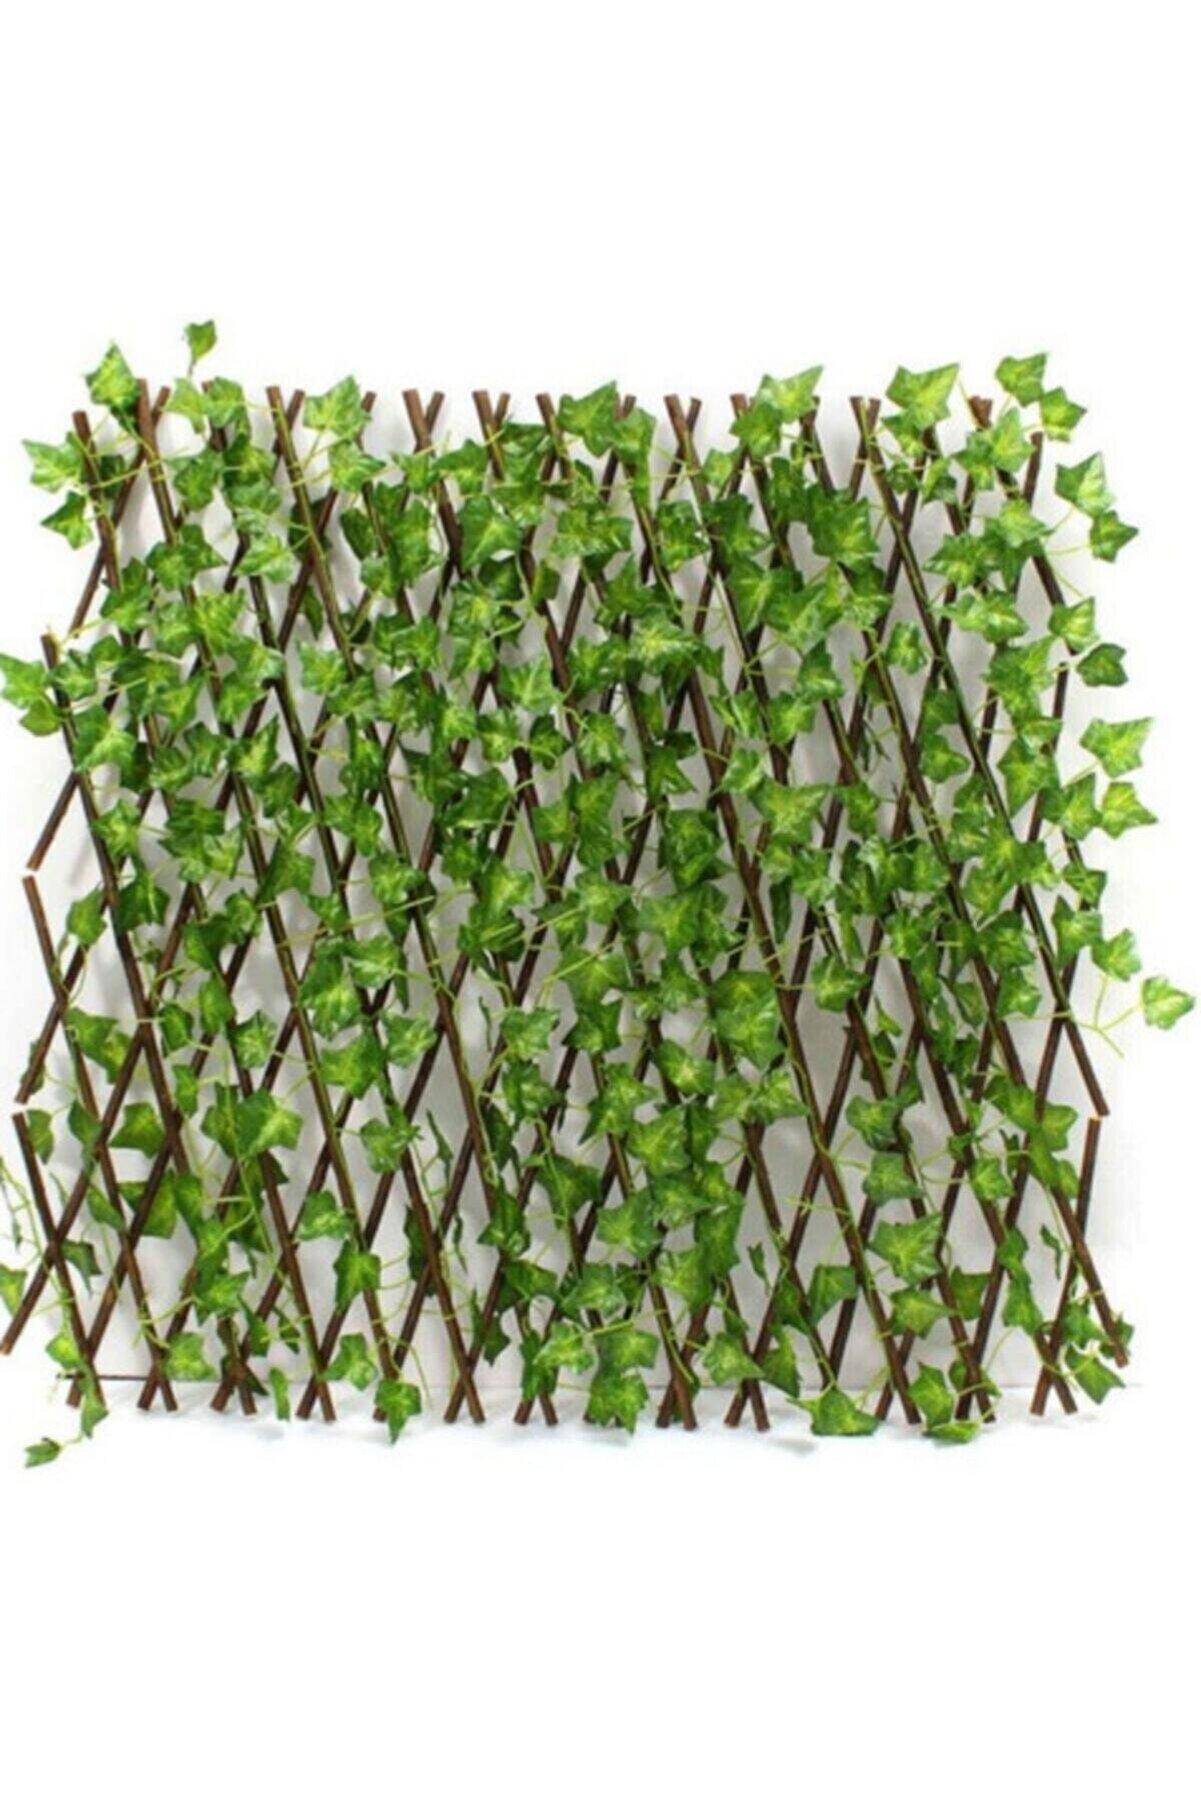 Efso Yapay Sarmaşık Yaprak Çit Bahçe Balkon Çiti 3x1.2 M